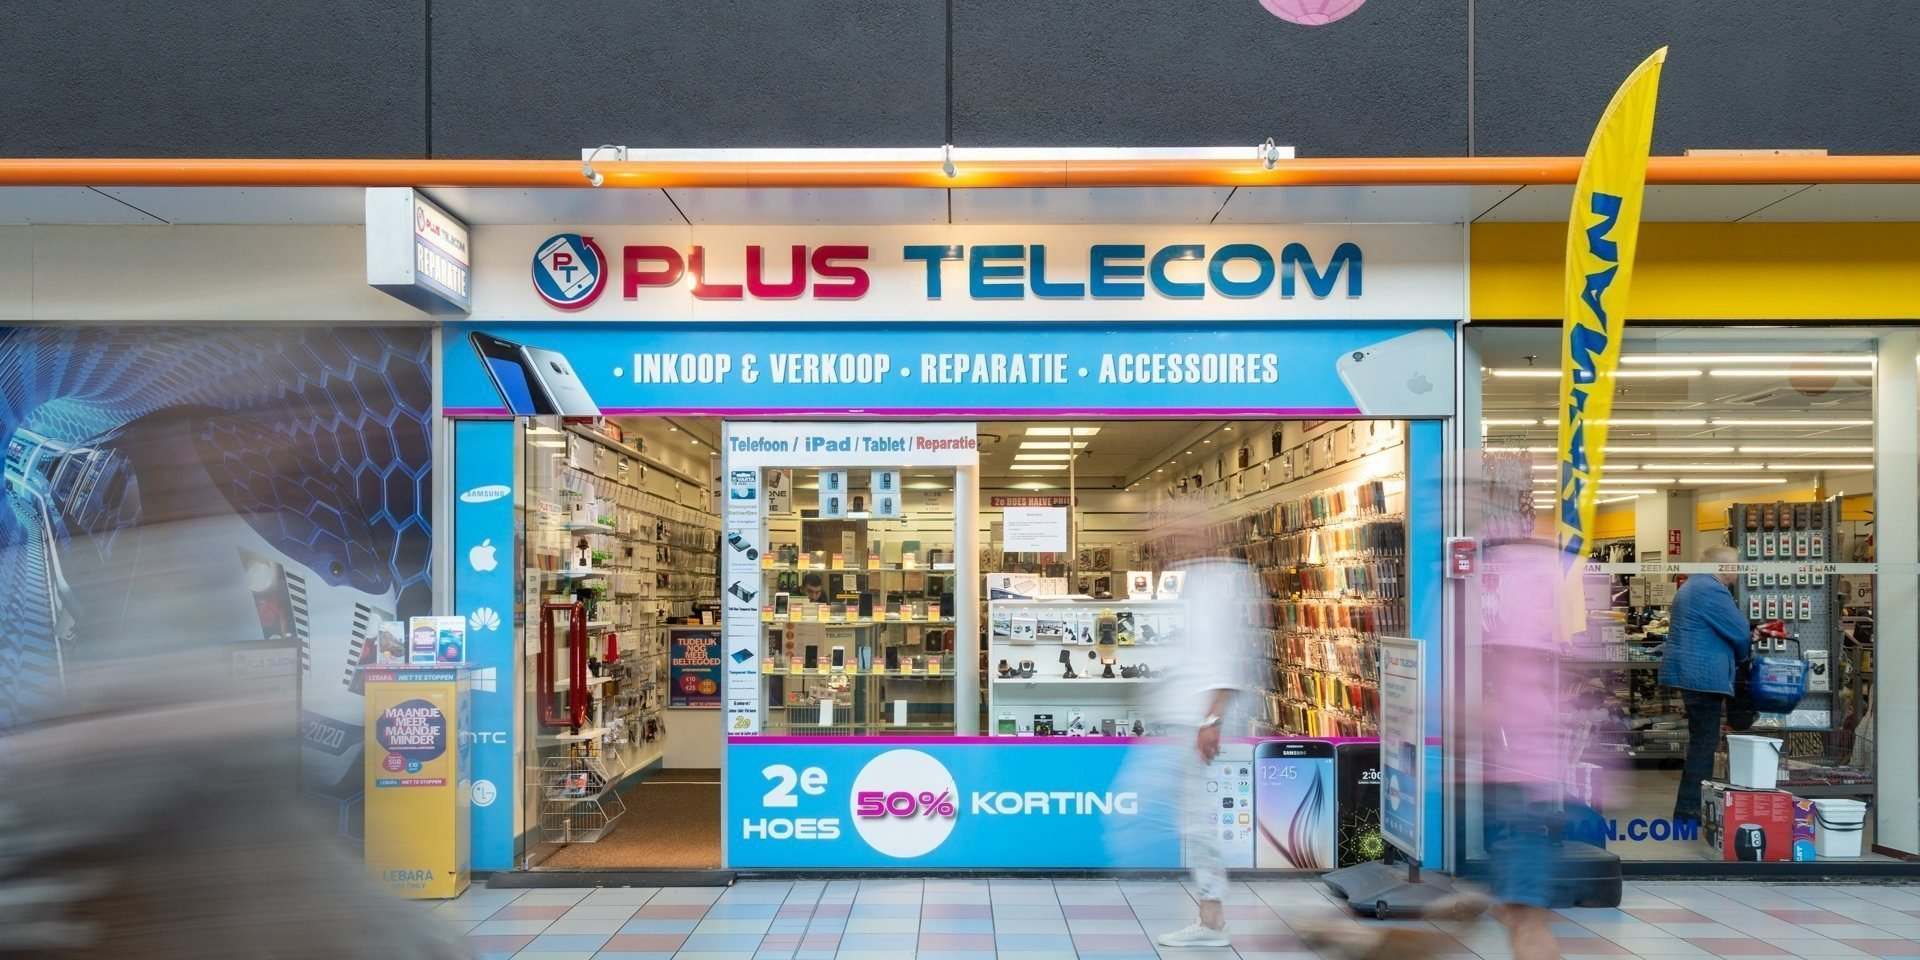 Mobiele telefonie, reparatie en accessoires